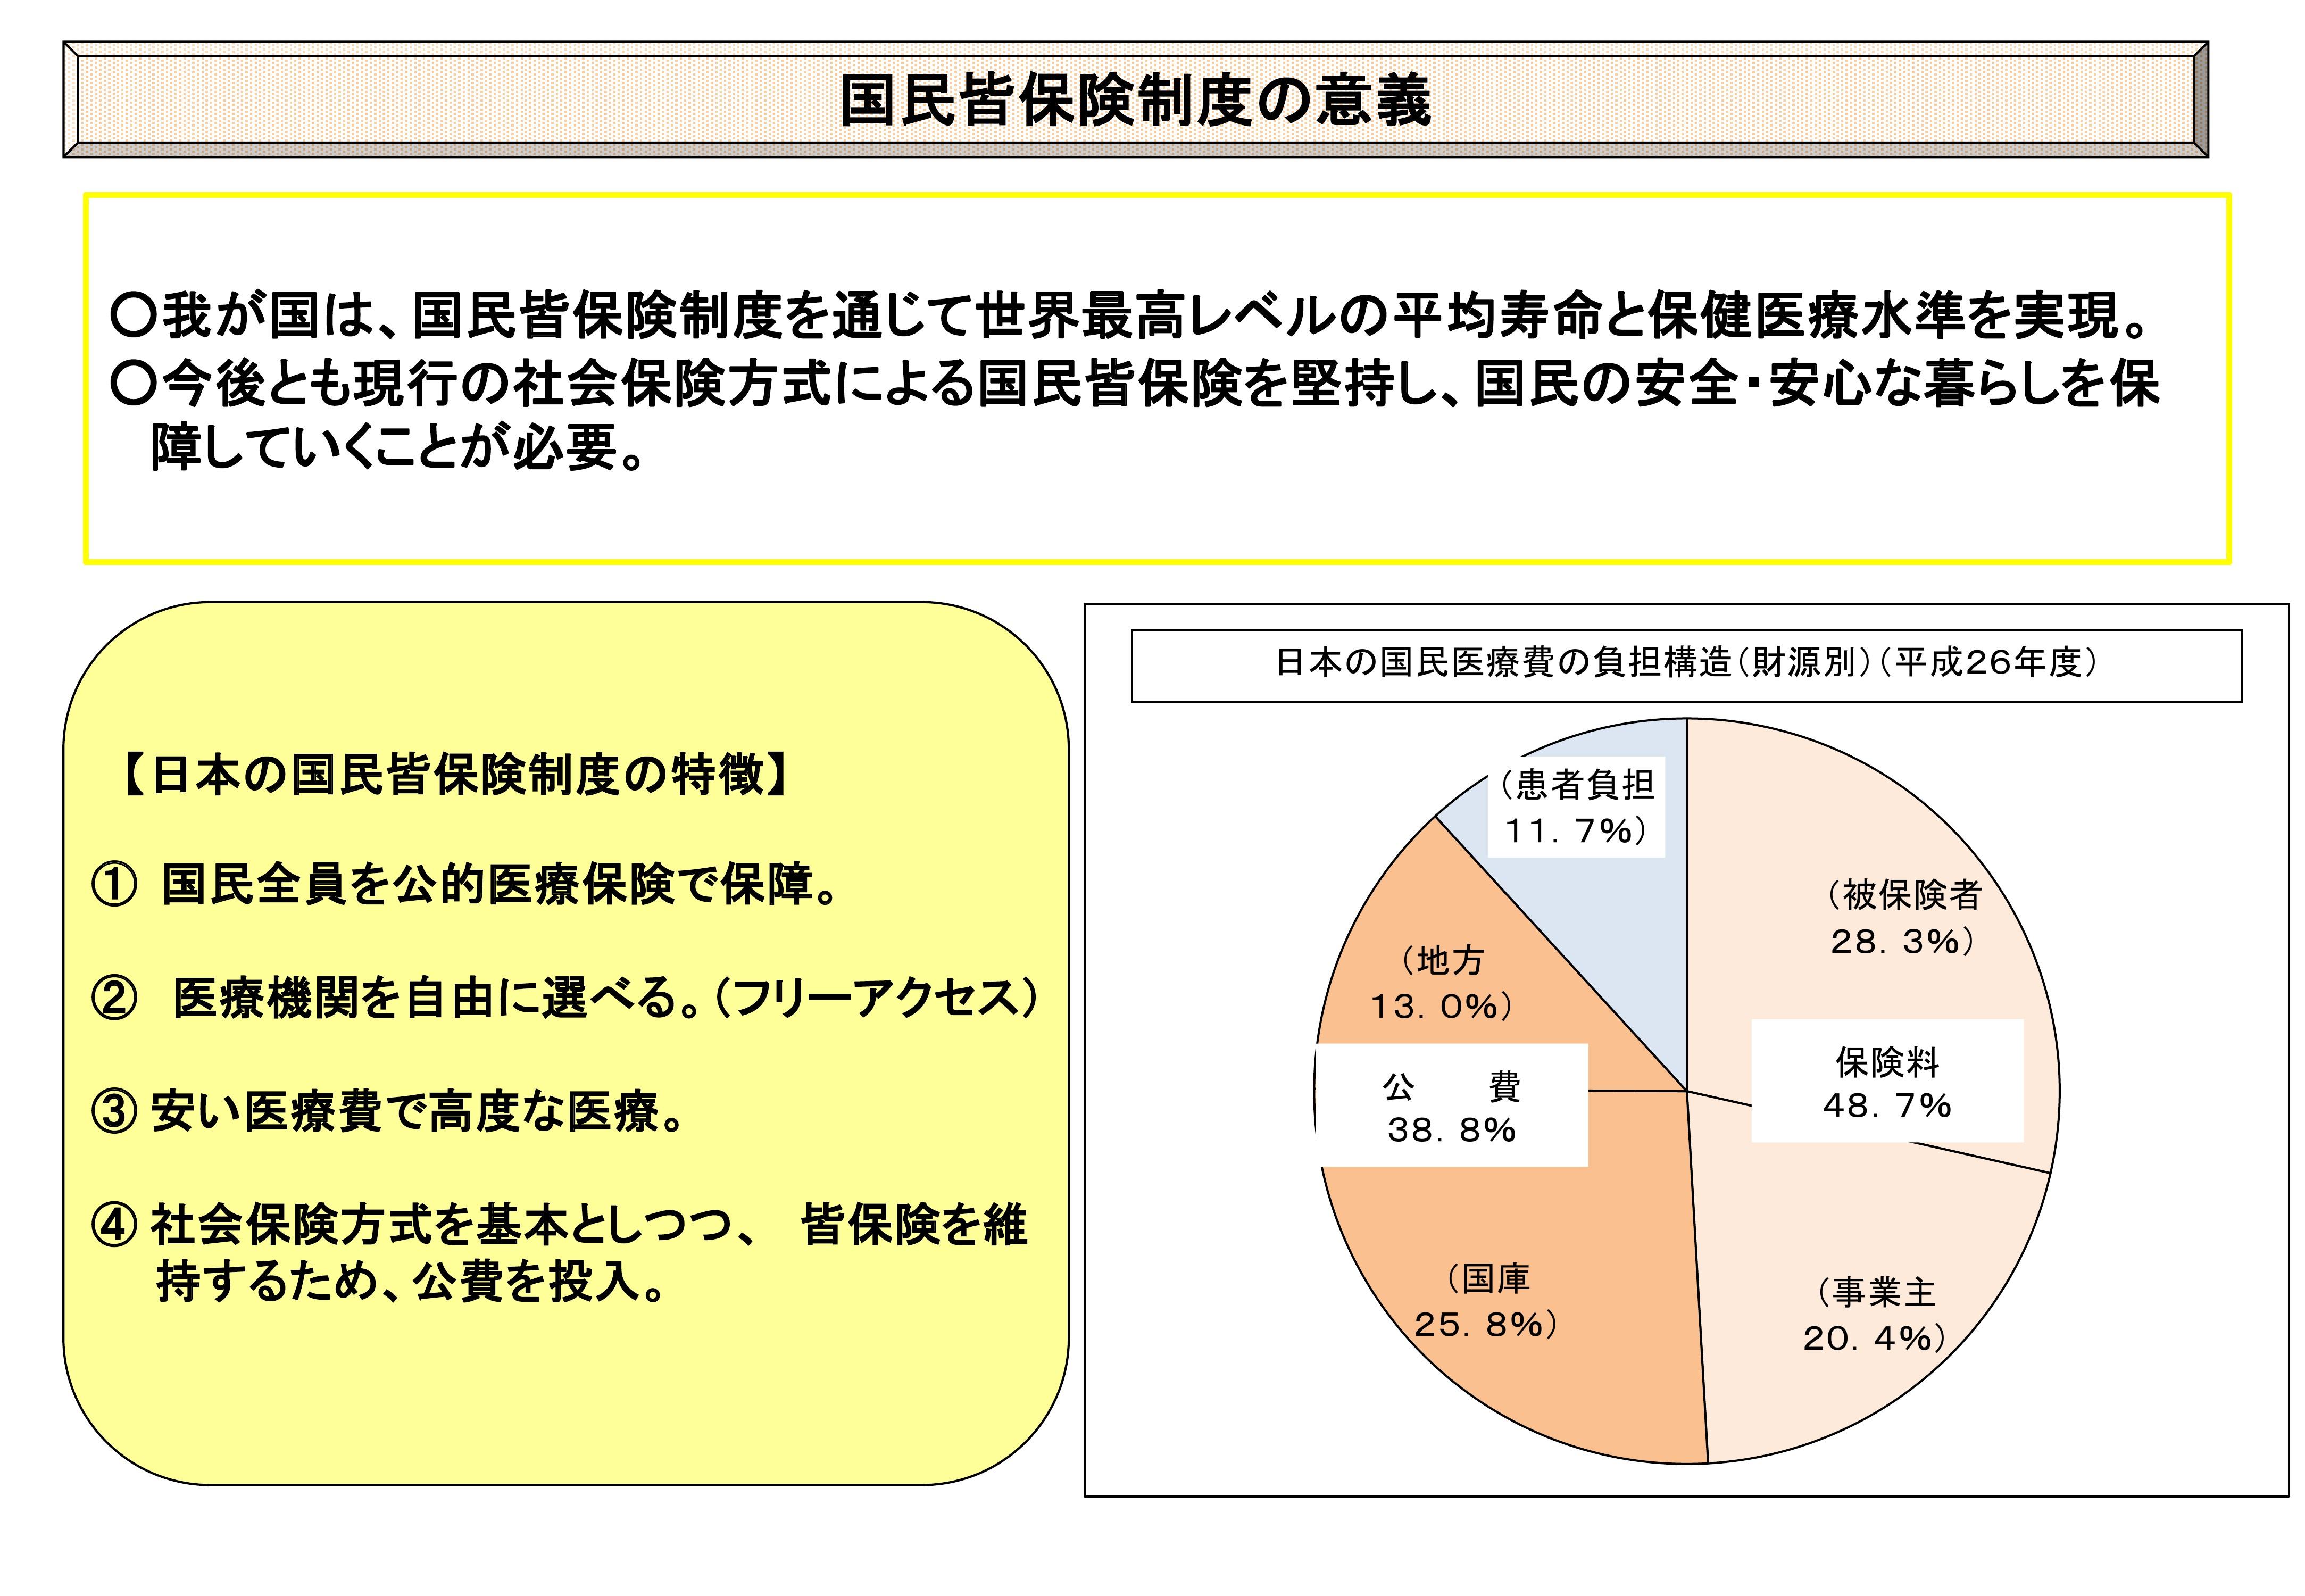 adobe pdf 文字認識 制度